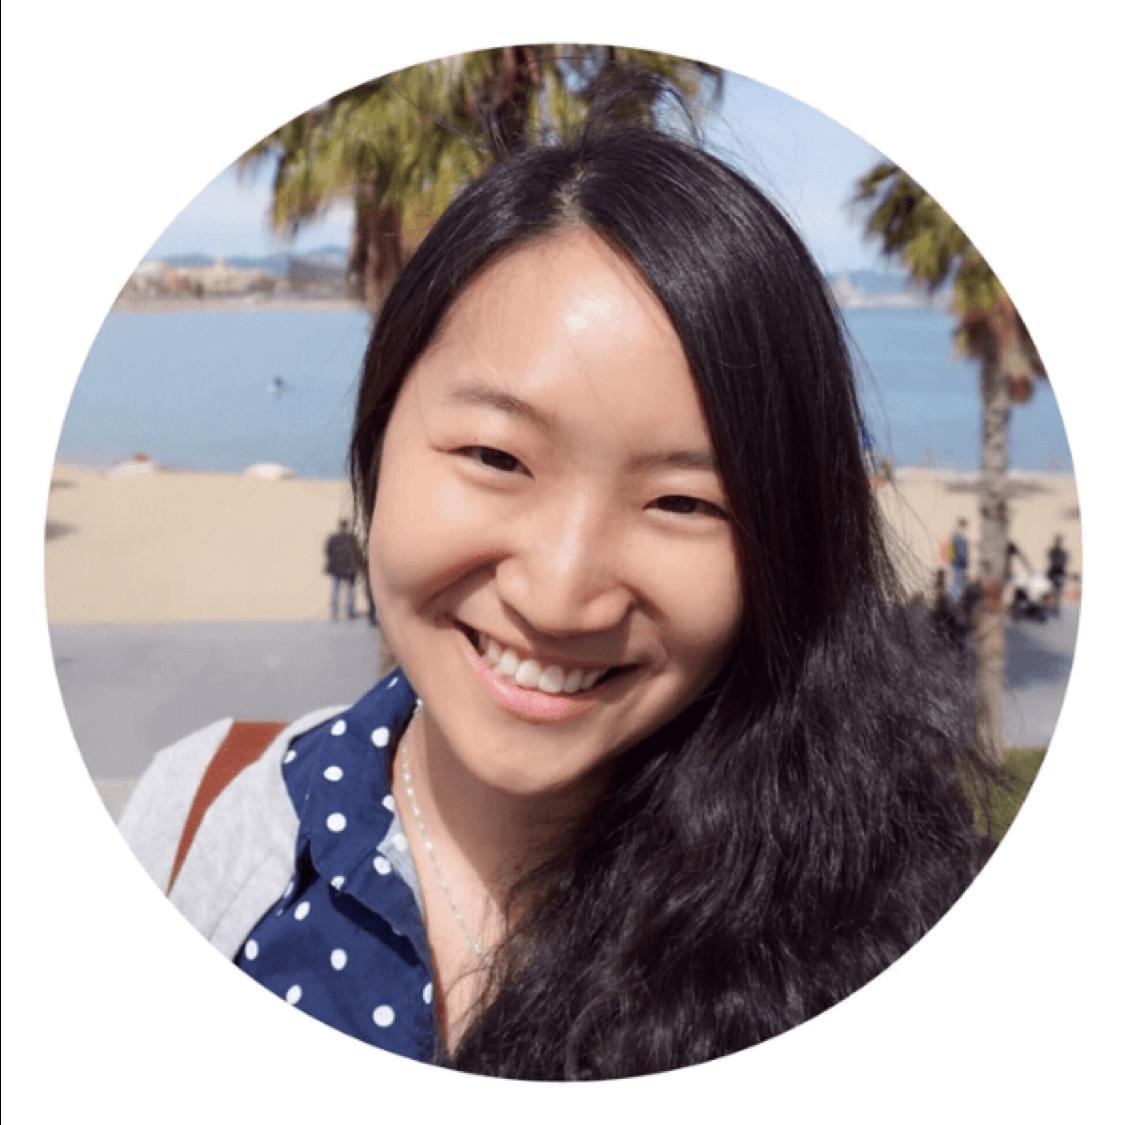 Susie Fan, Wharton MBA '20, Co-President